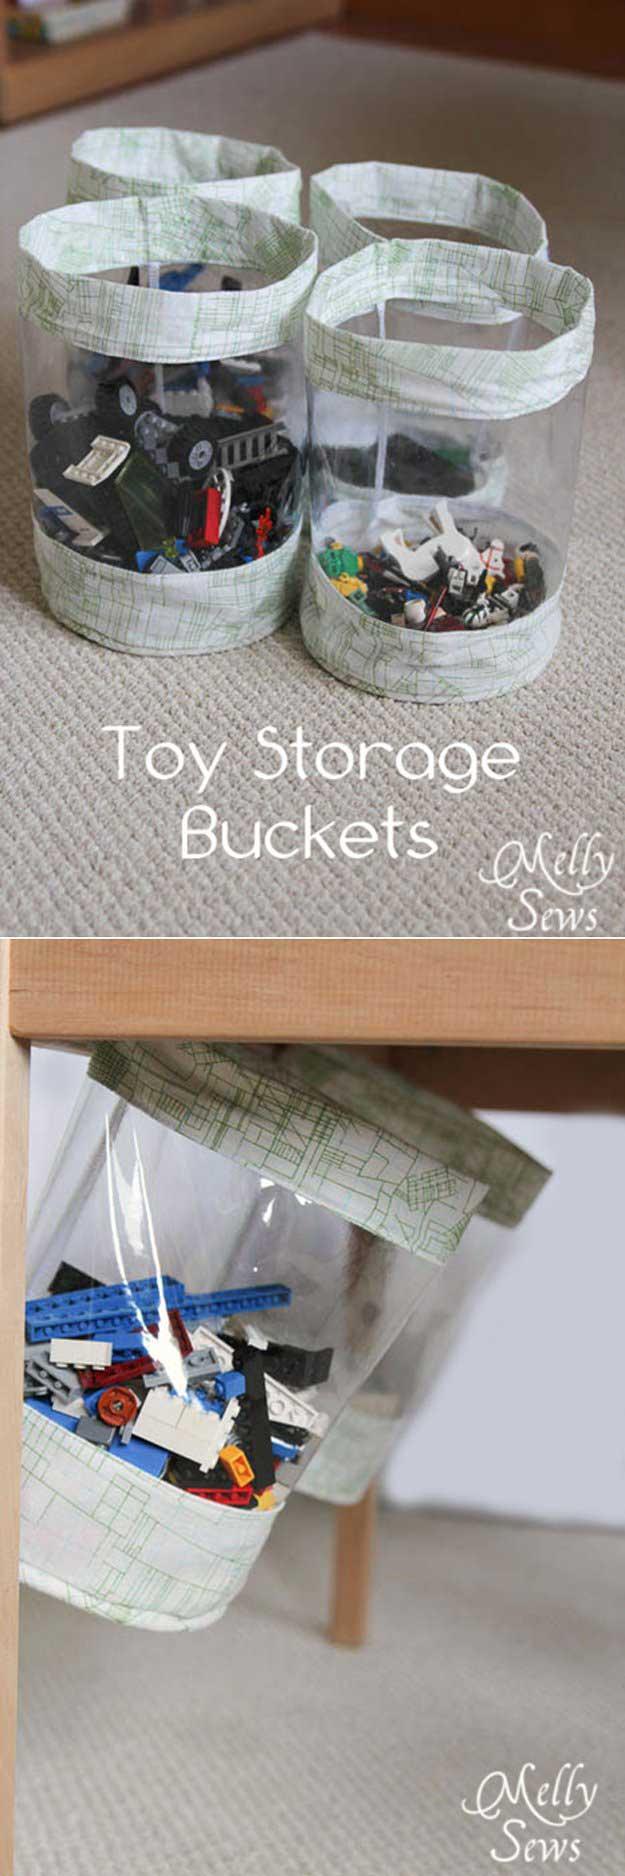 24 Smart DIY Toy & Crafts Storage Solutions - New Craft Works